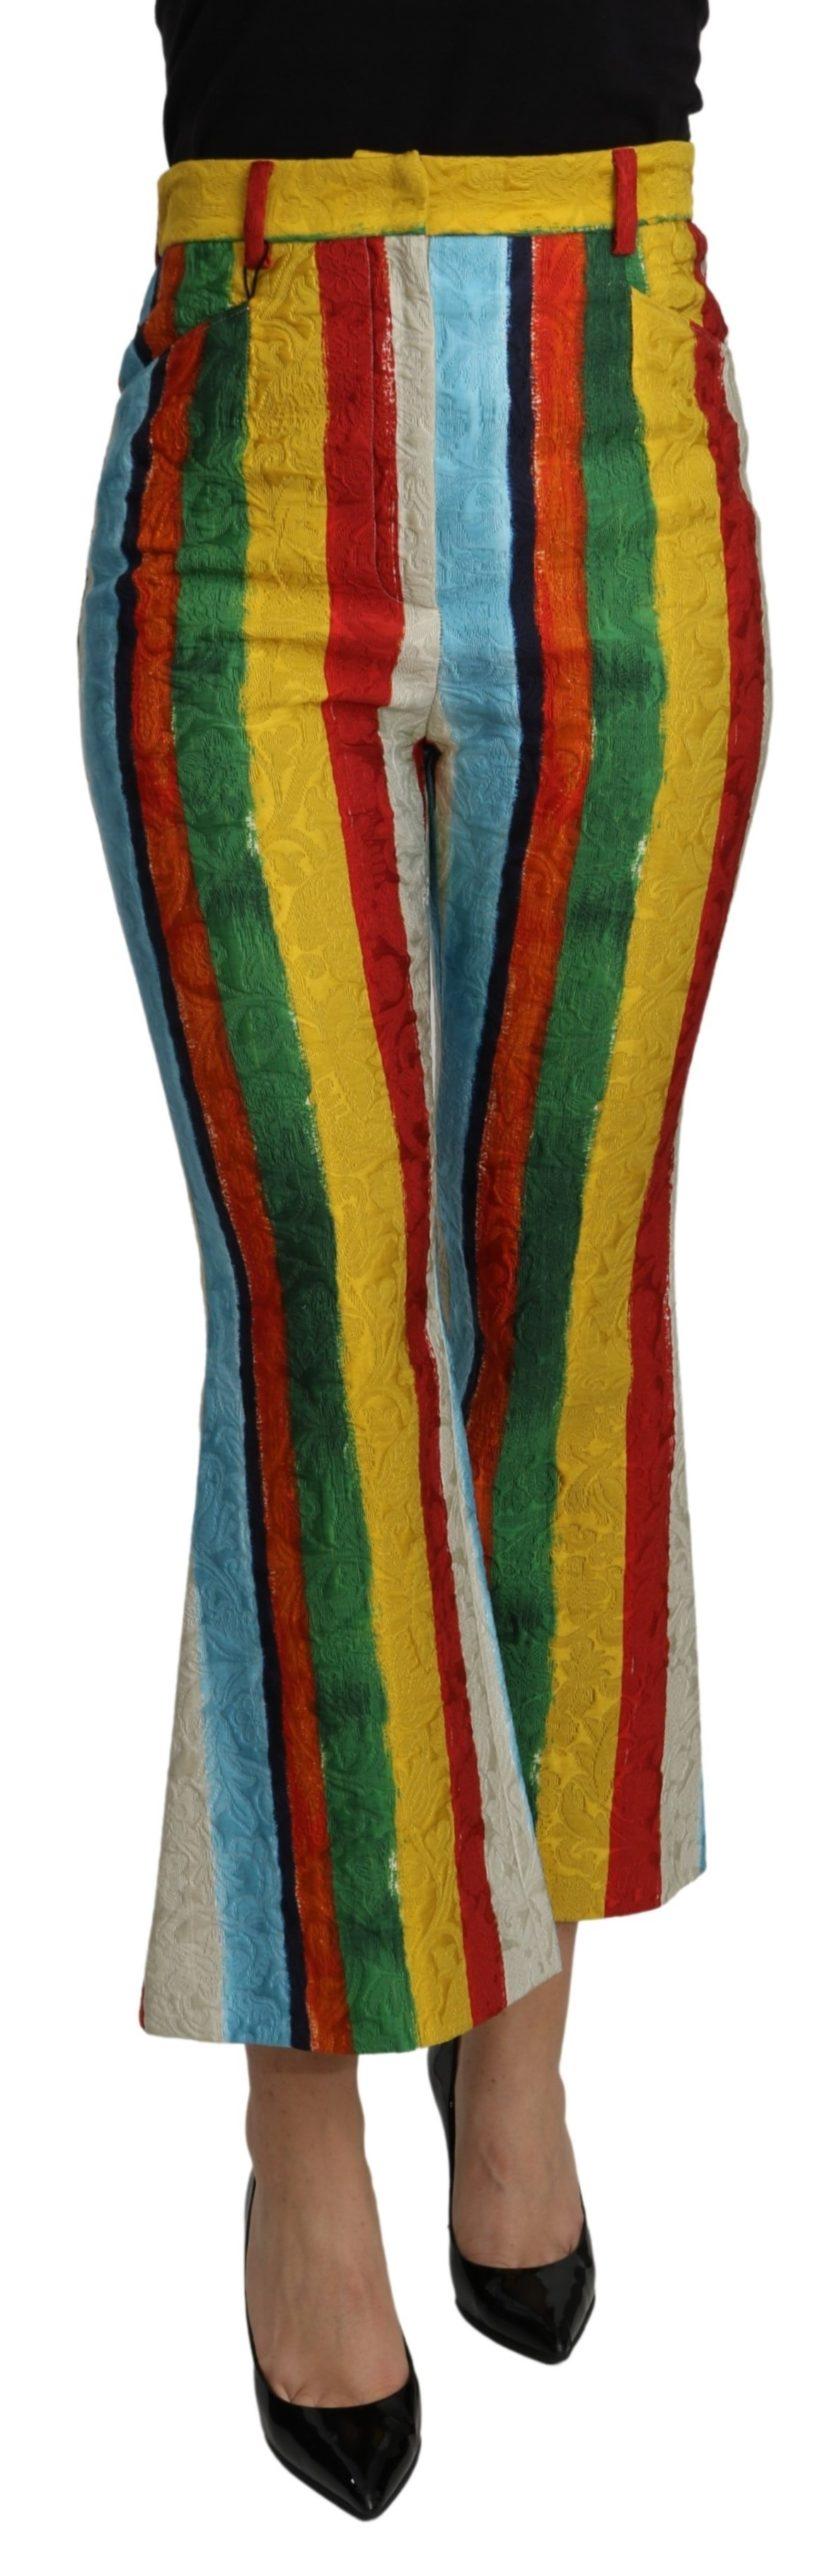 Dolce & Gabbana Women's Stripes Flared Brocade Trouser Multicolor PAN71090 - IT36 | XS